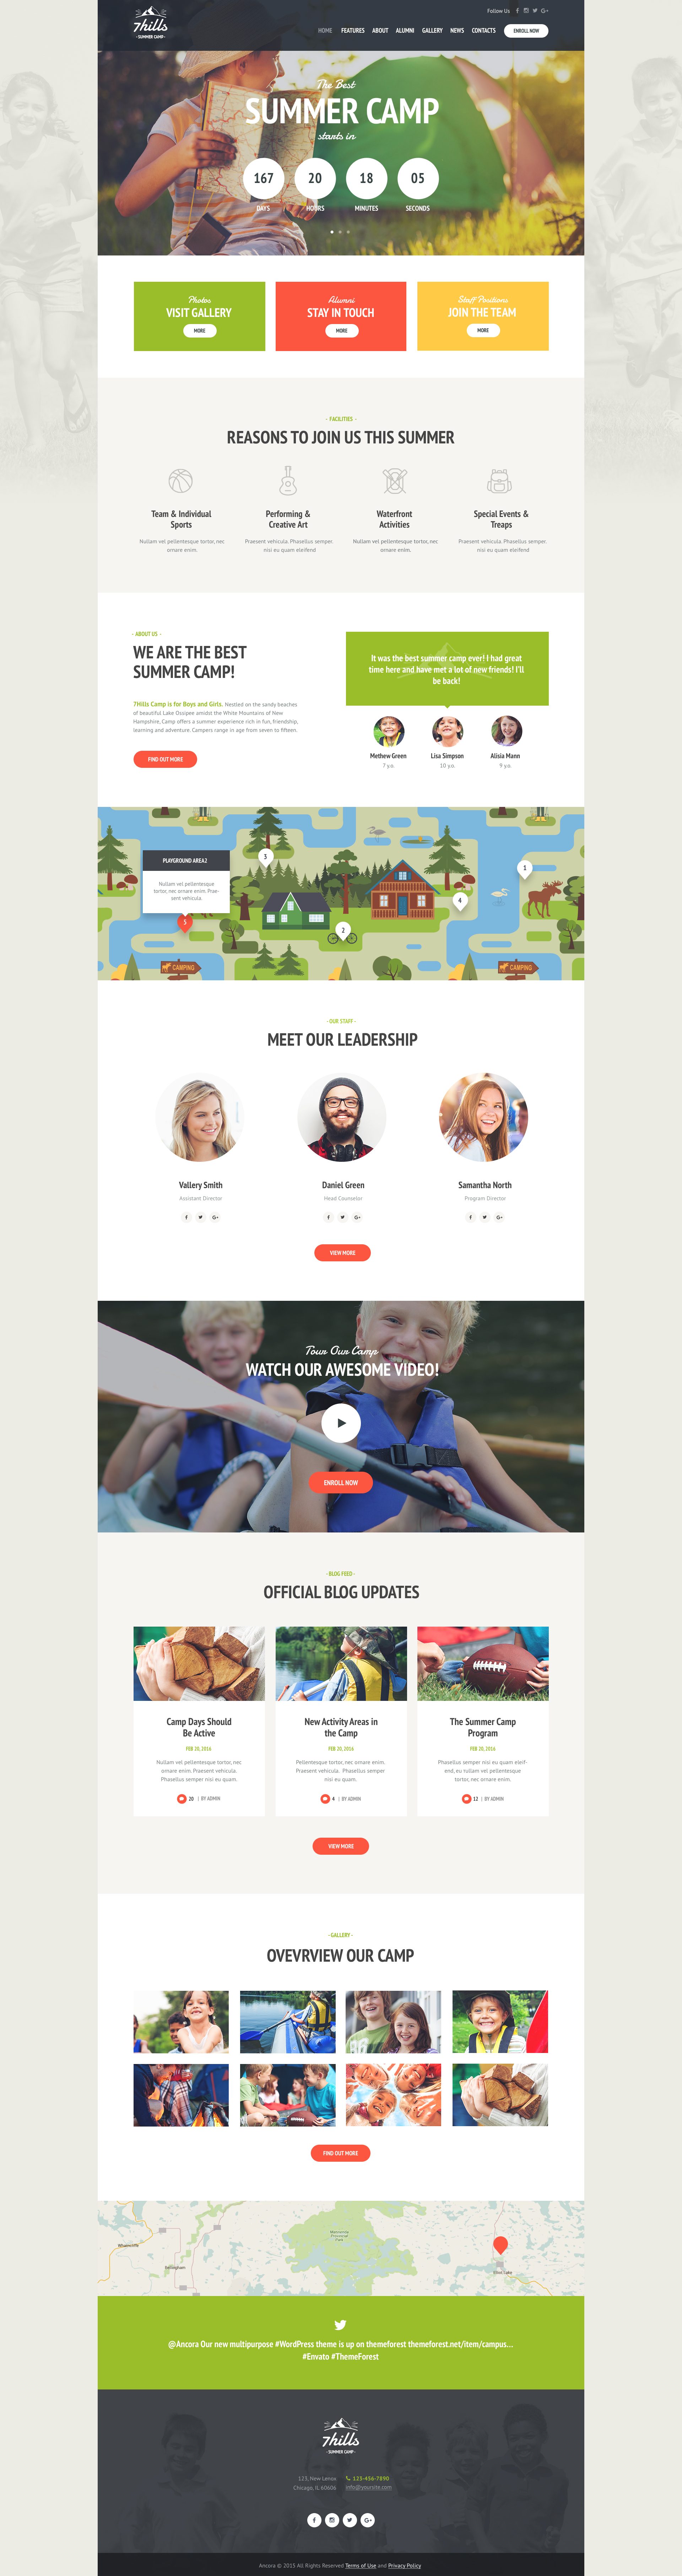 SevenHills - Summer Camp WordPress Theme